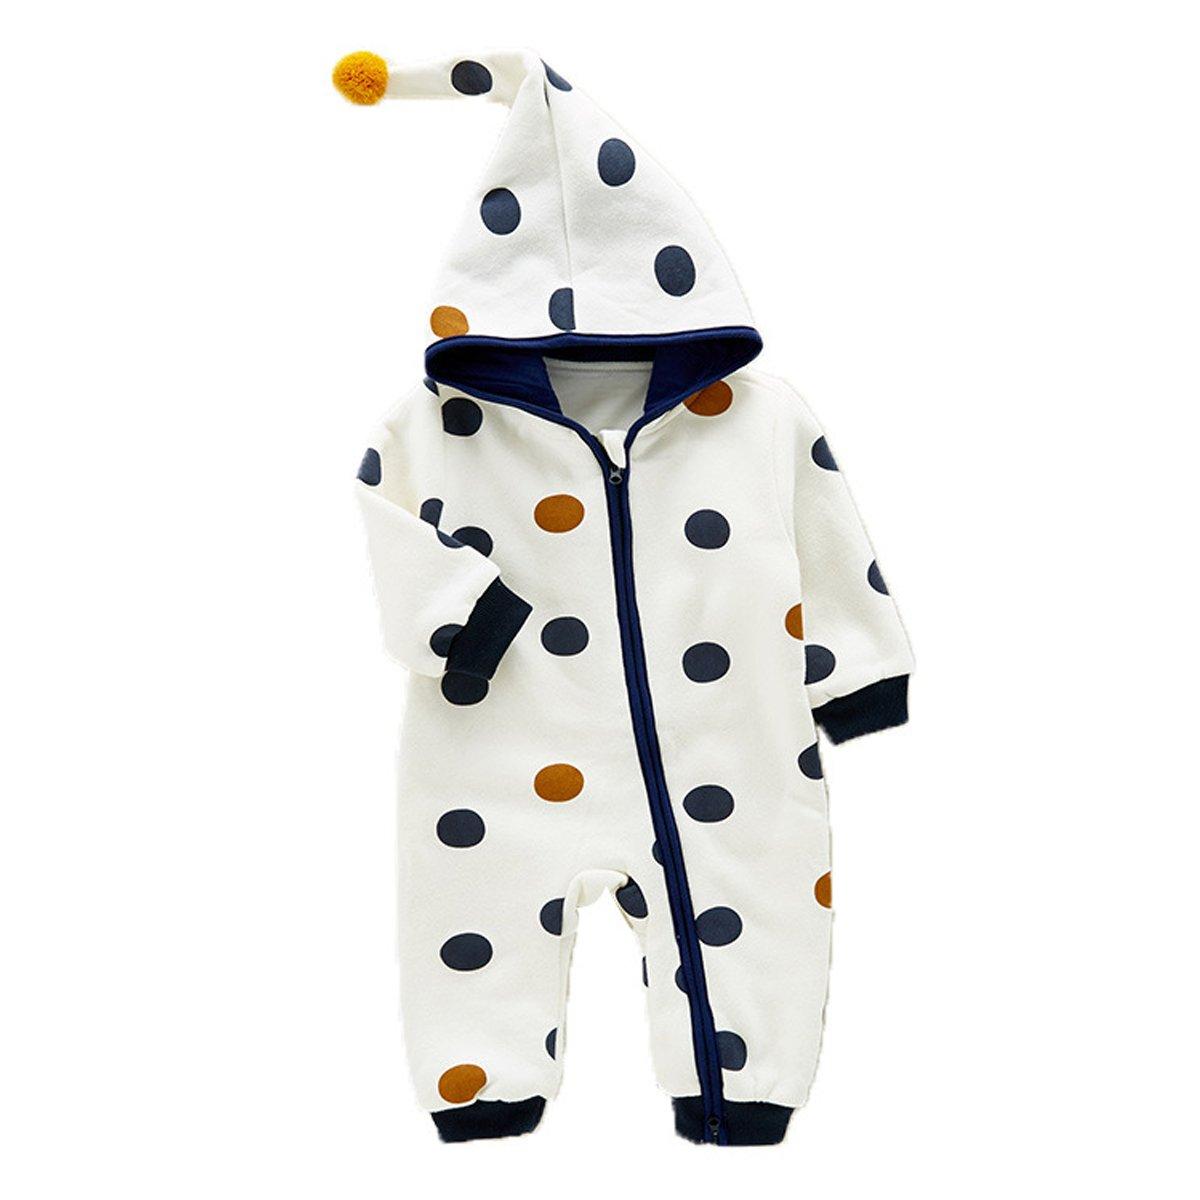 Kanodan Baby Boys Girls Romper Autumn Winter Hooded Jumpsuit Zipper Bodysuit